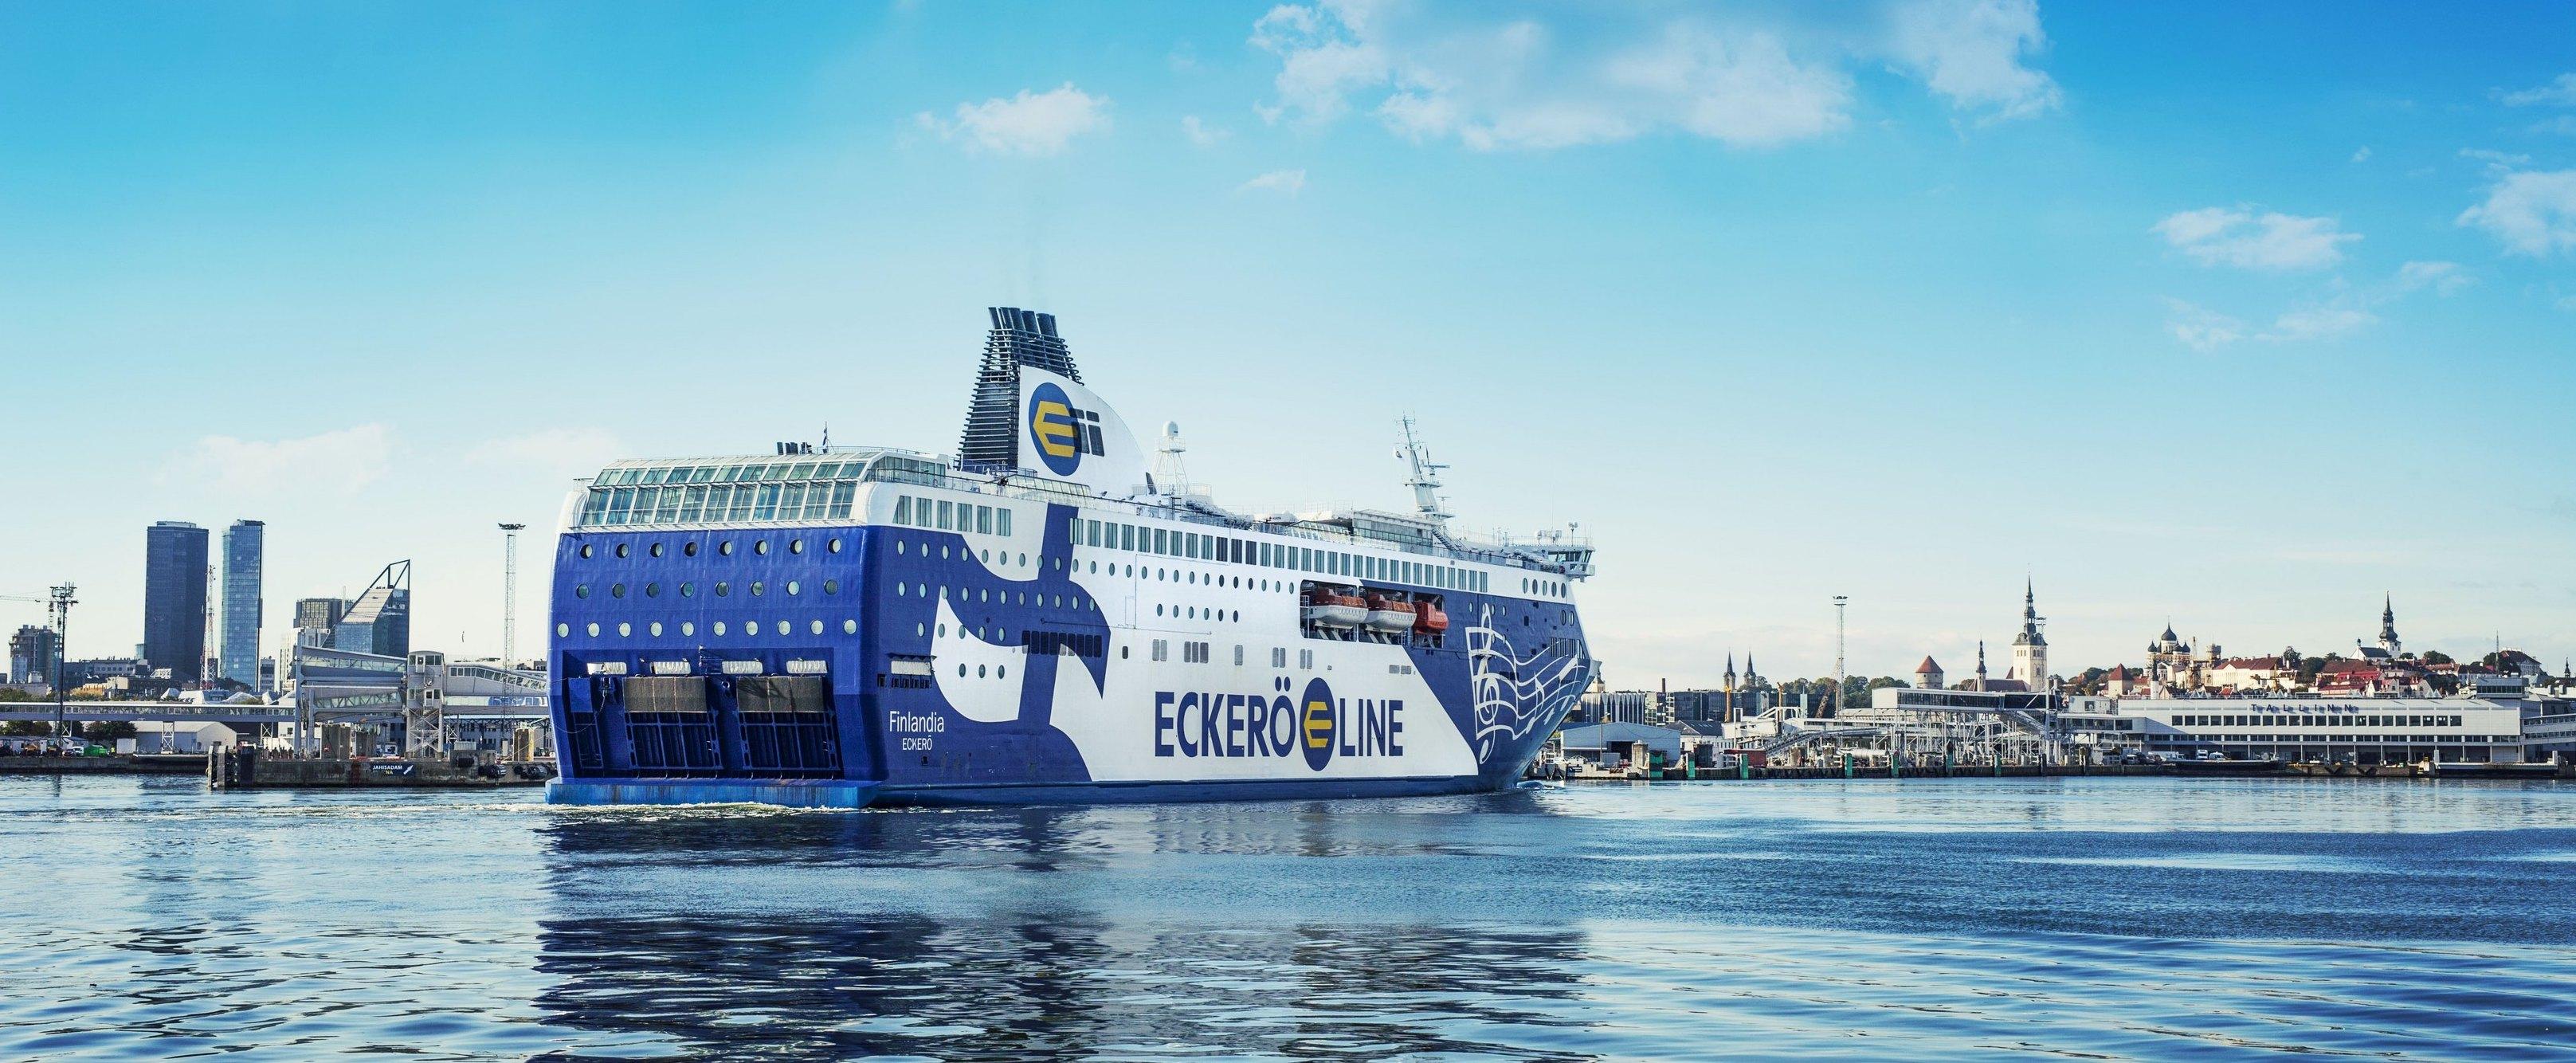 Photo of Eckerö Line - Finlandia ship